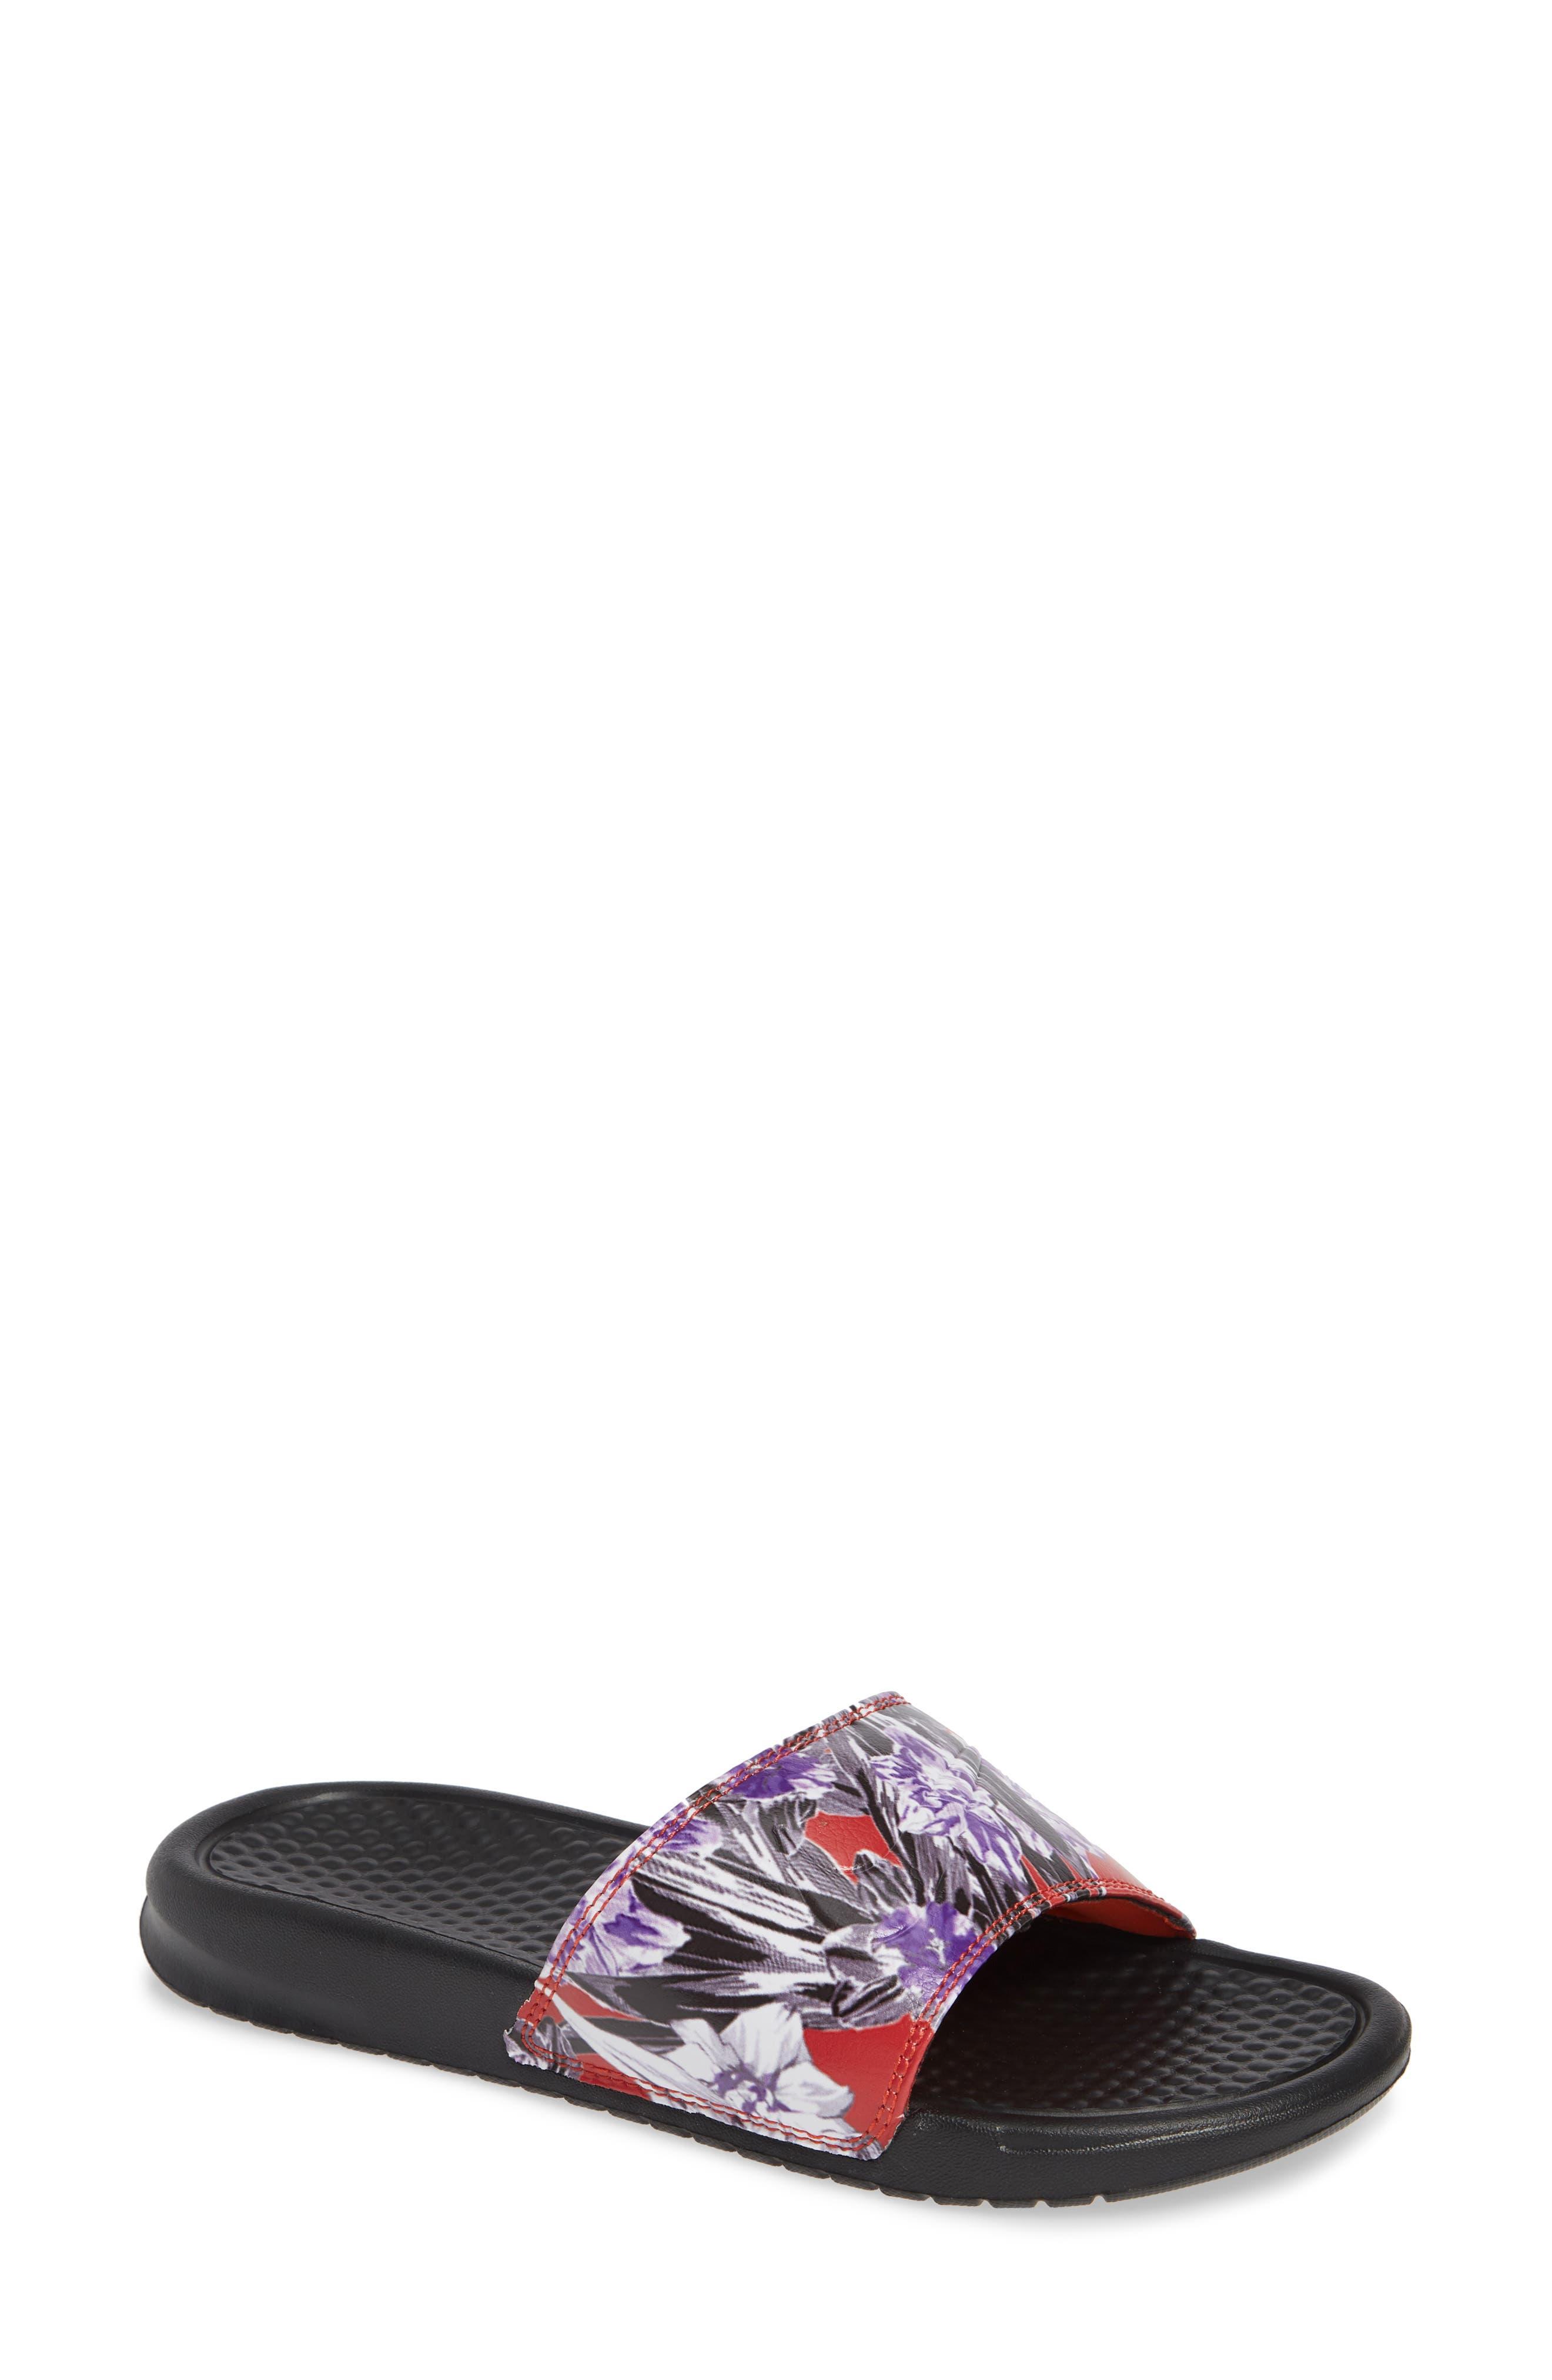 sale retailer e22d6 5aecb Nike 'Benassi - Just Do It' Print Sandal, Orange